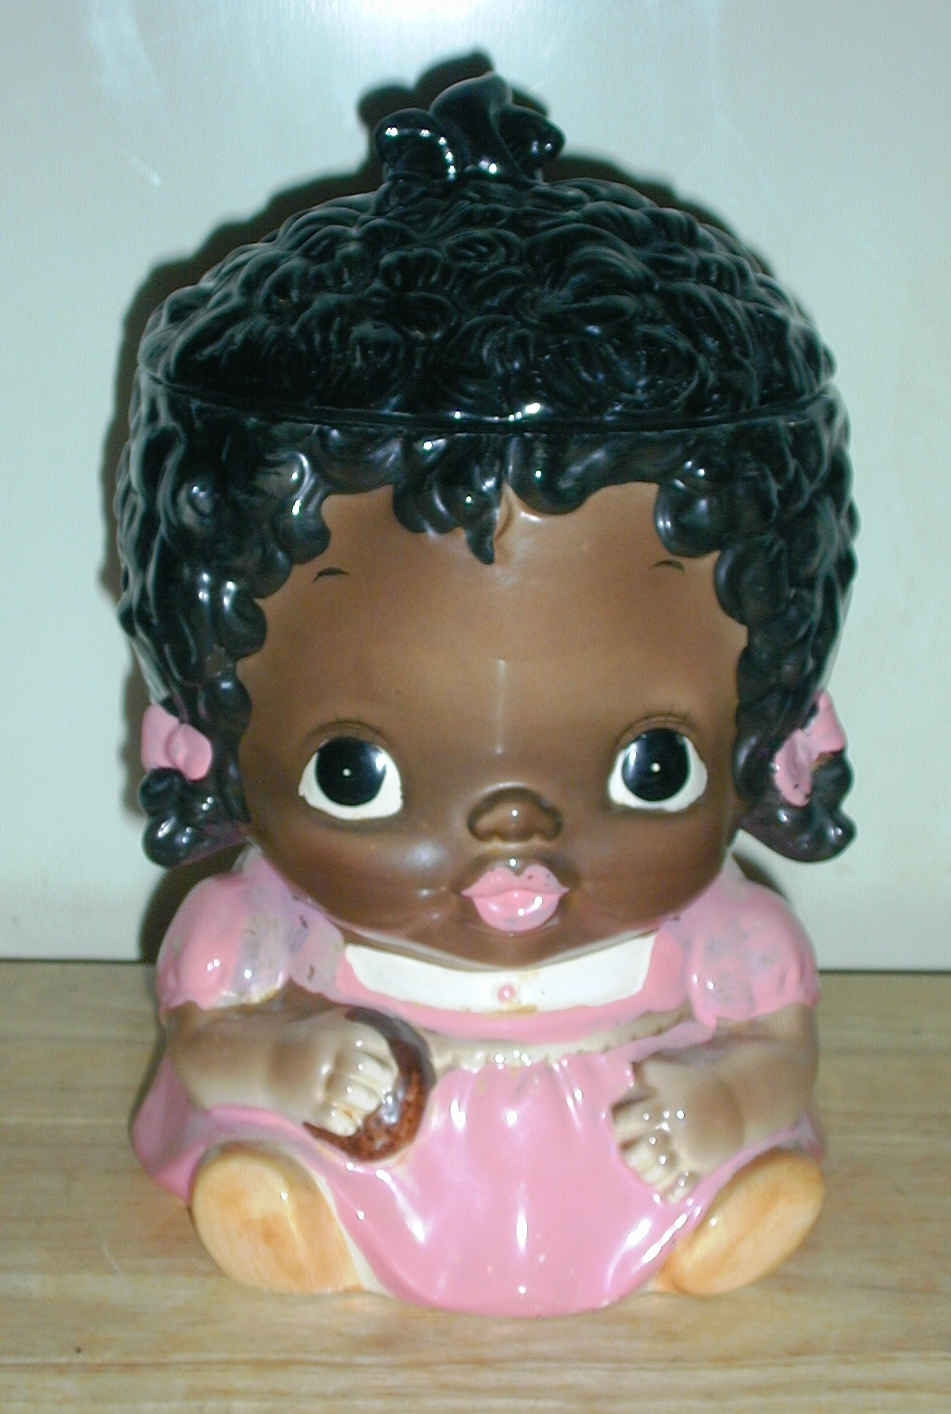 Little Black Girl Collector Cookie Jar By Sears Roebuck -7854